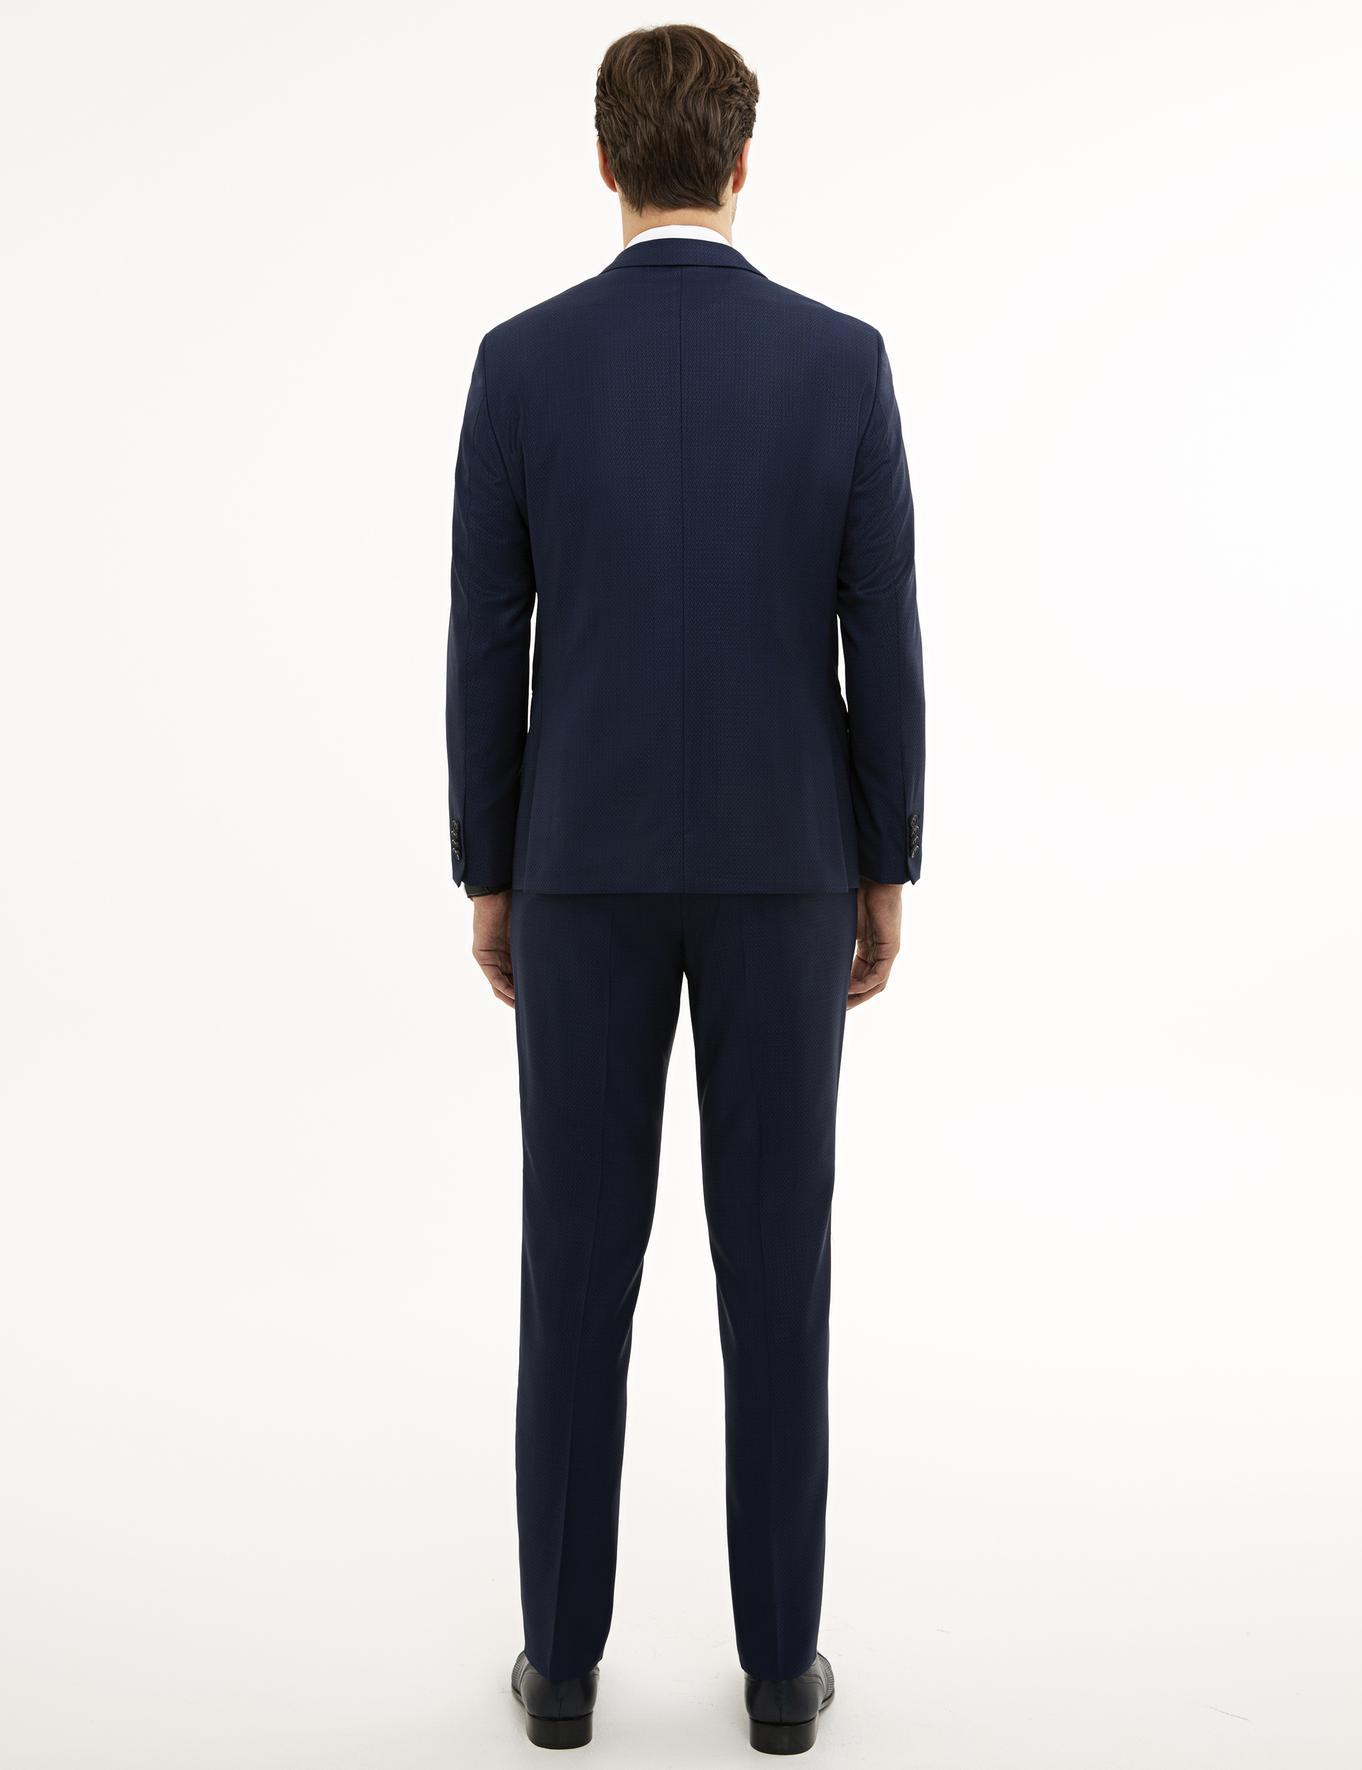 Mavi Slim Fit Takım Elbise